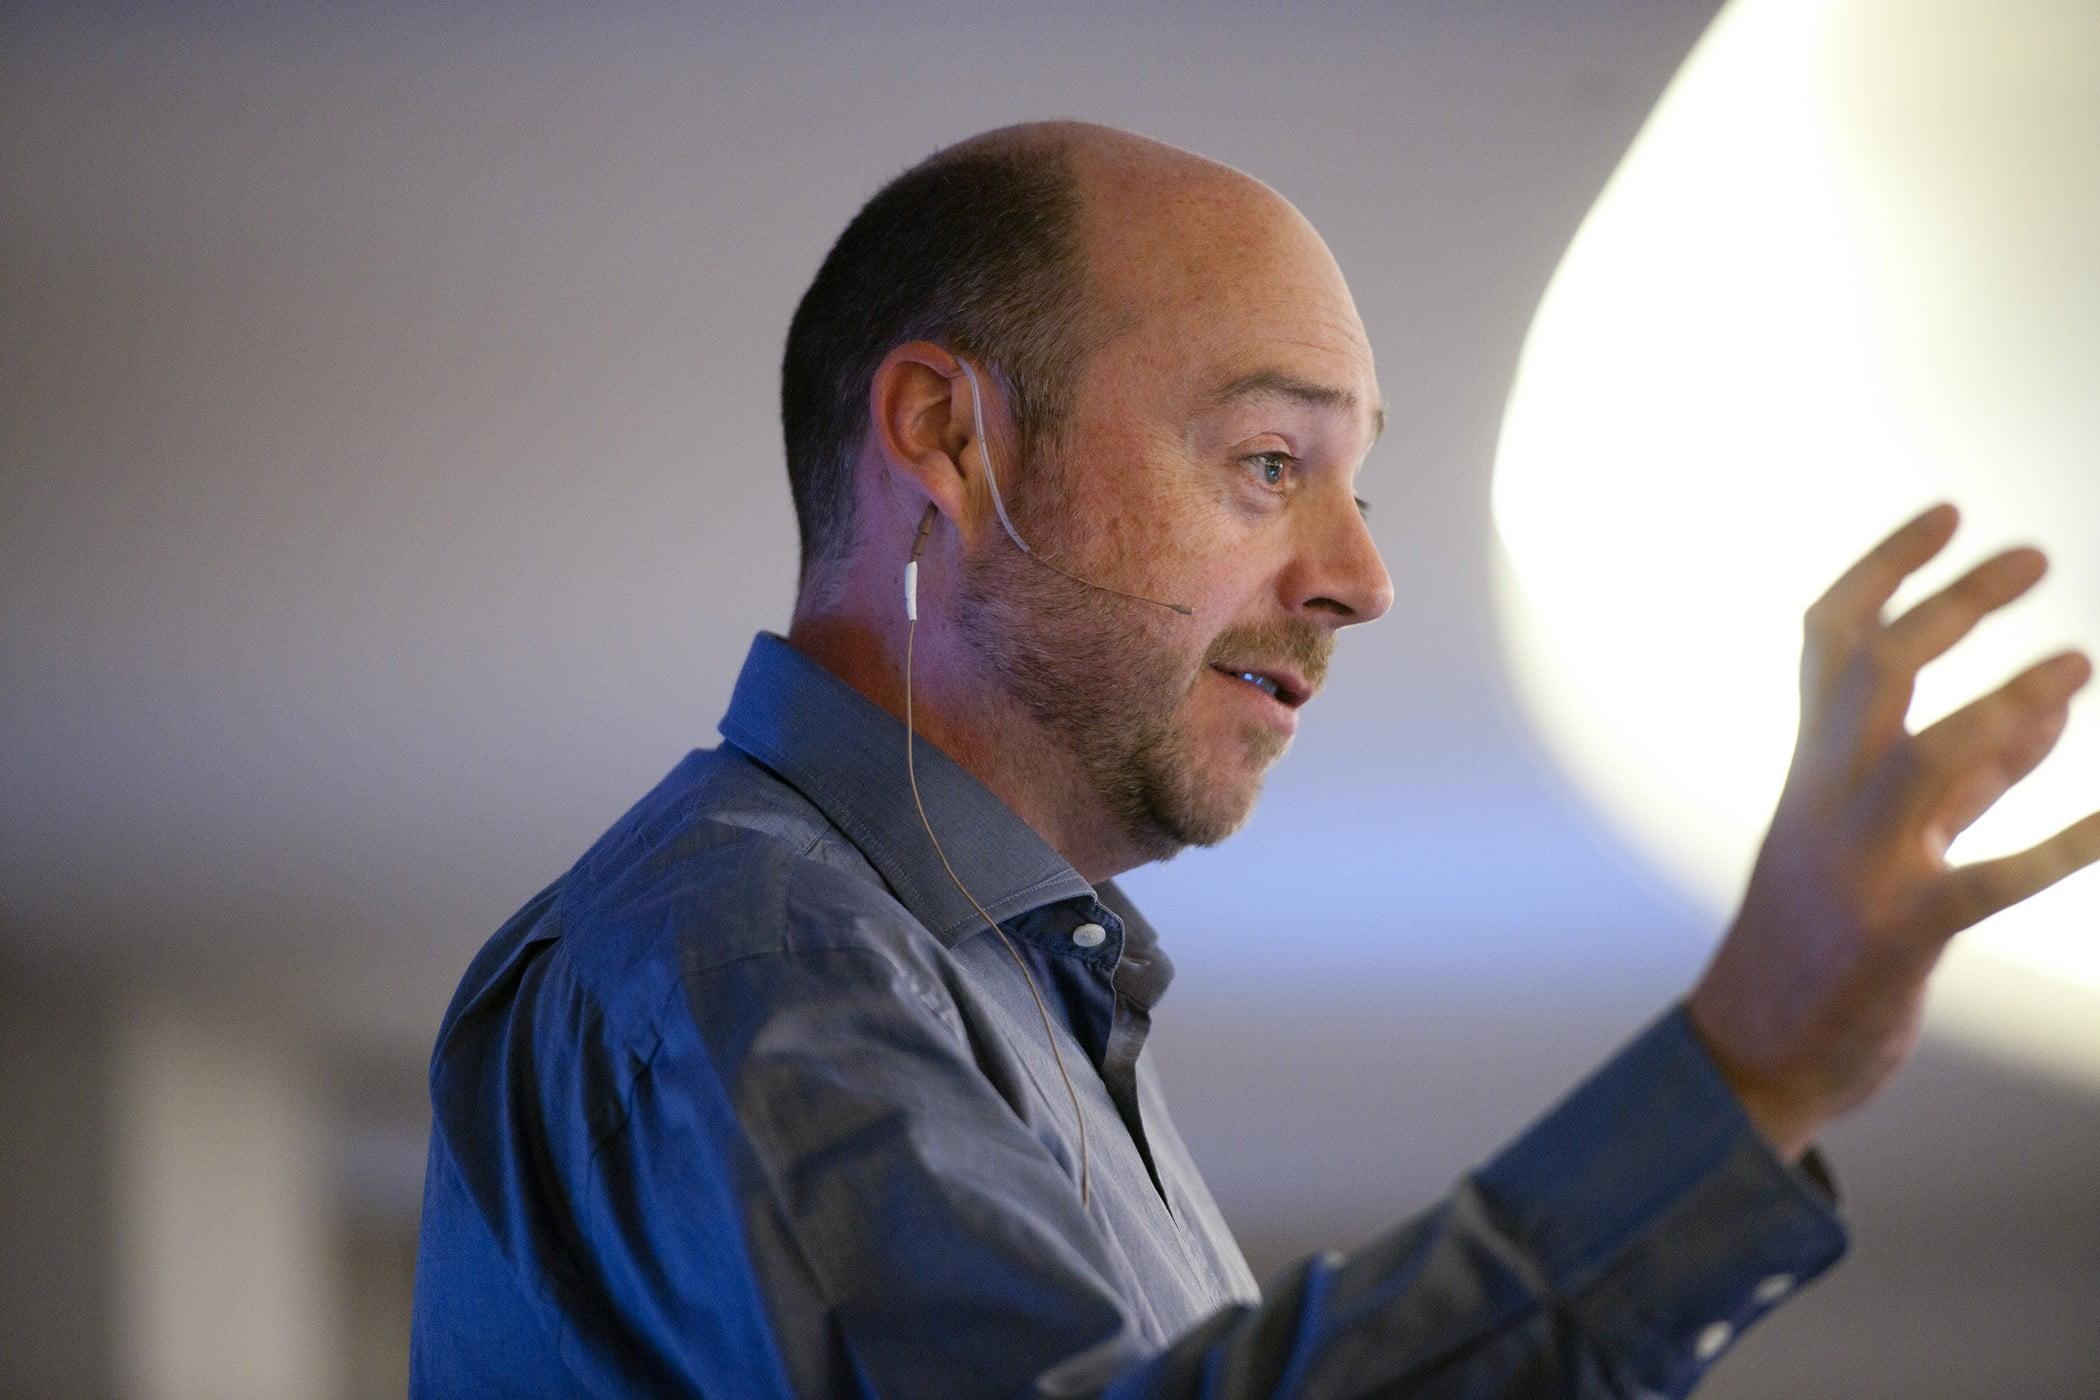 Jonathan Hemus Crisis Management Speaker